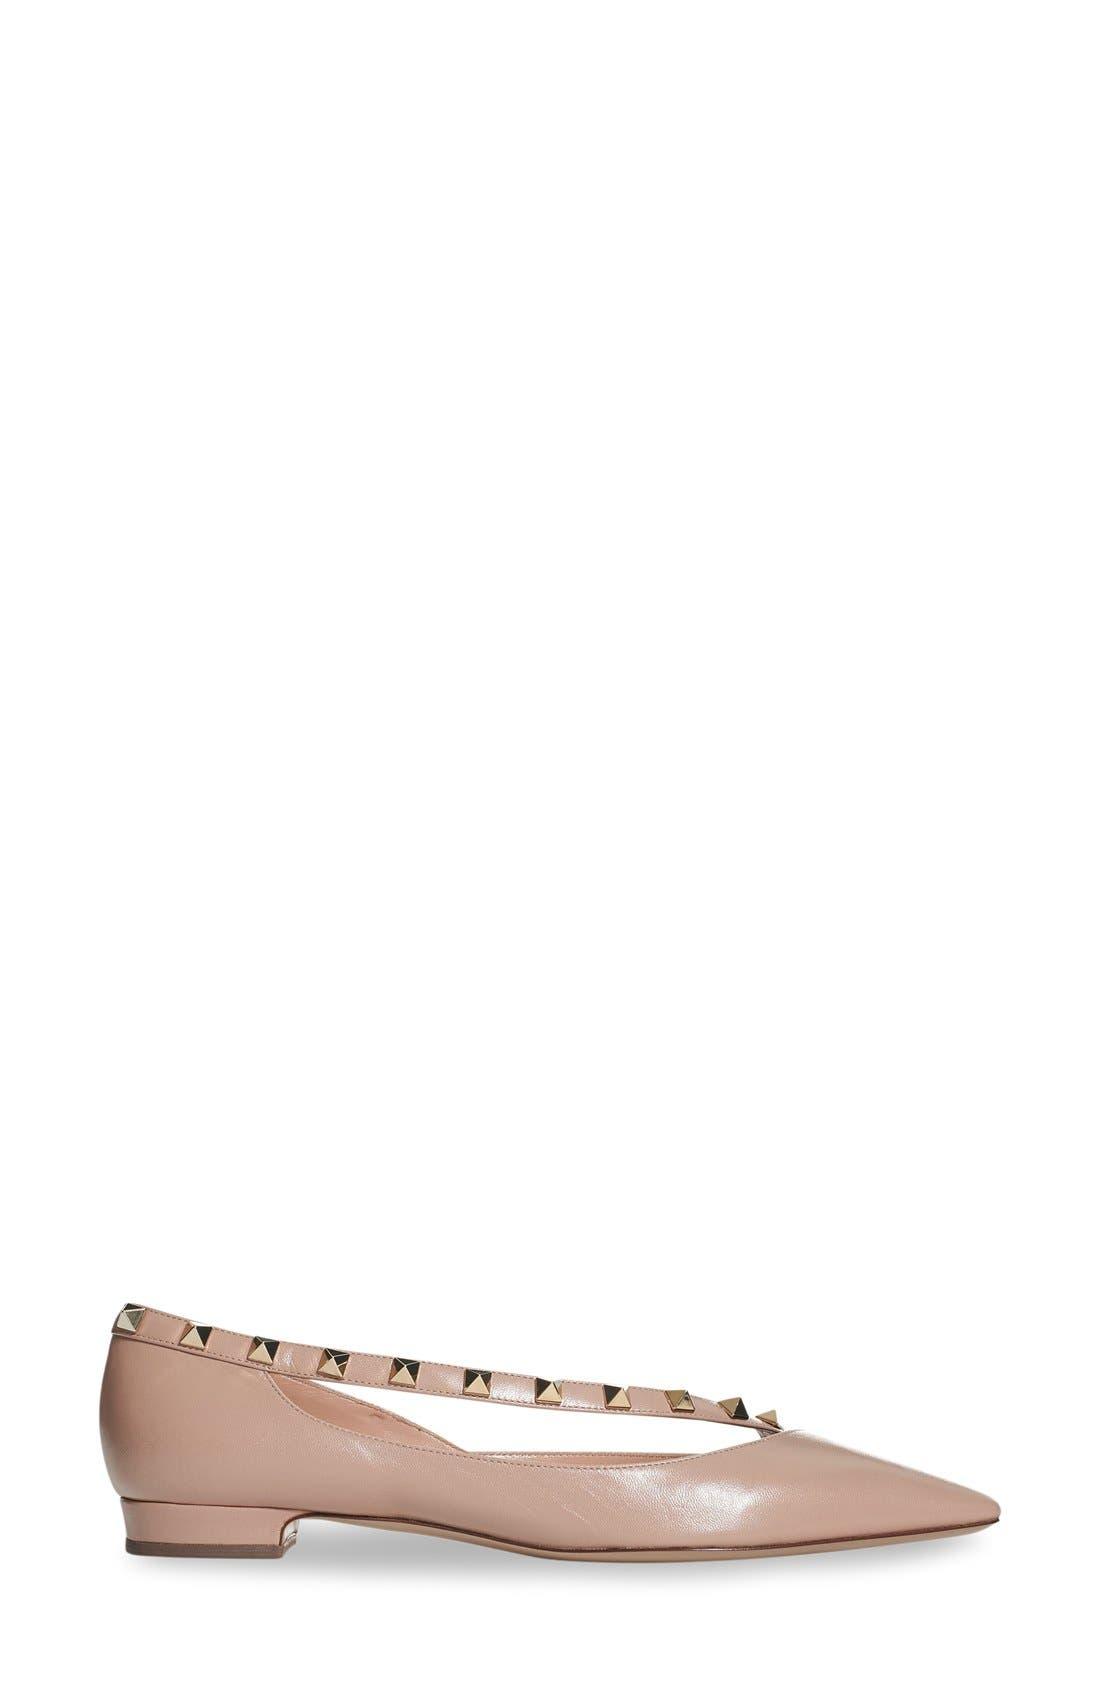 Alternate Image 3  - Valentino 'Rockstud' Demi d'Orsay Flat (Women)